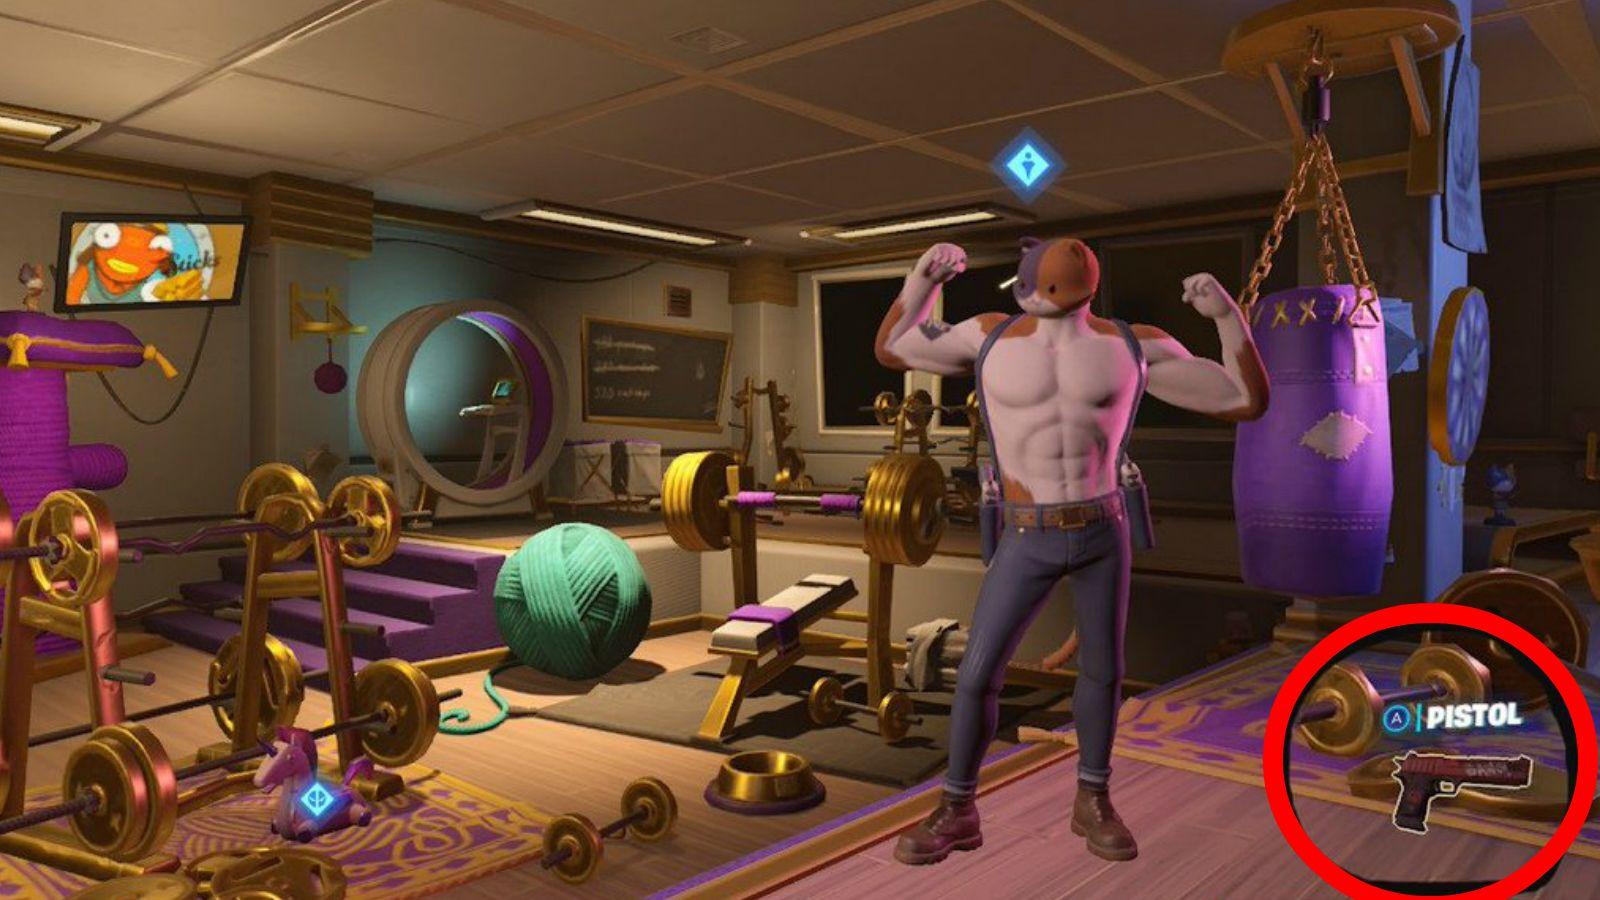 défi deadpool fortnite Epic Games Semaine 7